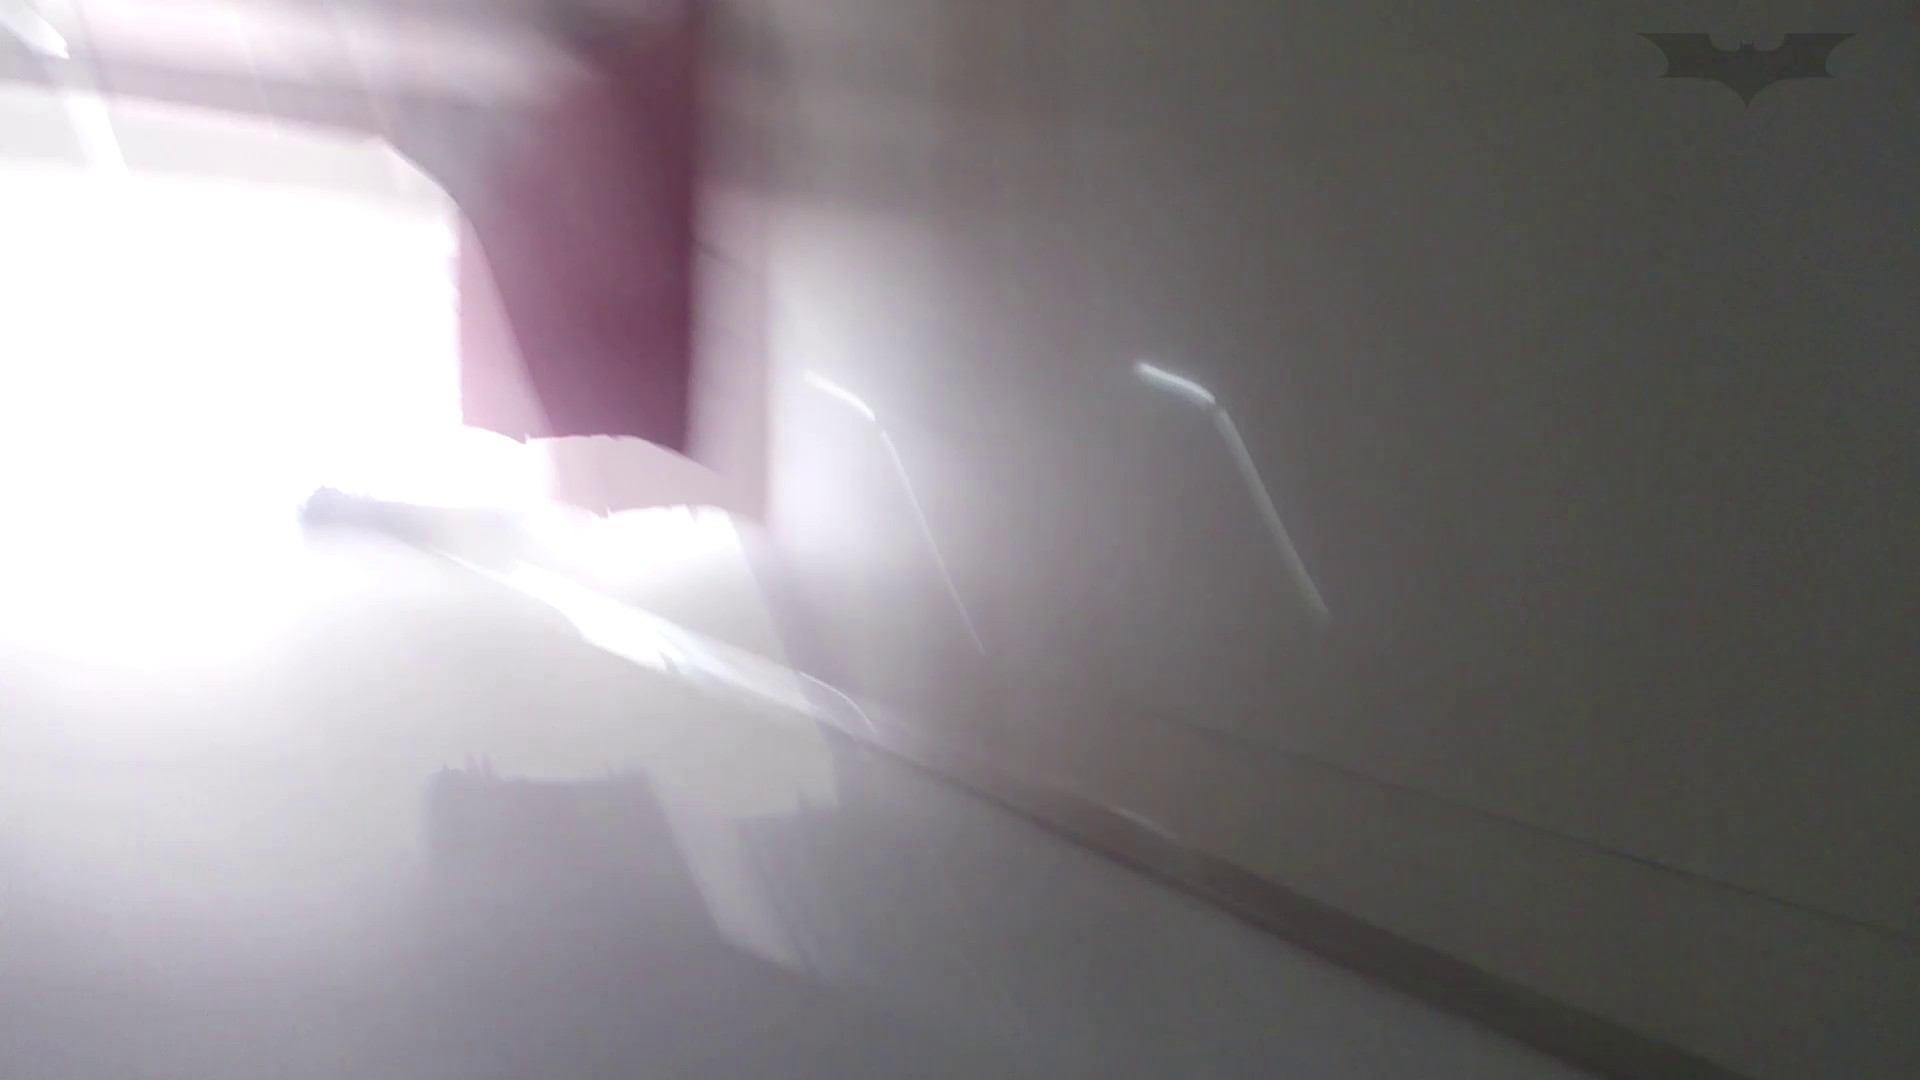 JD盗撮 美女の洗面所の秘密 Vol.75 ギャル攻め ワレメ無修正動画無料 110画像 35